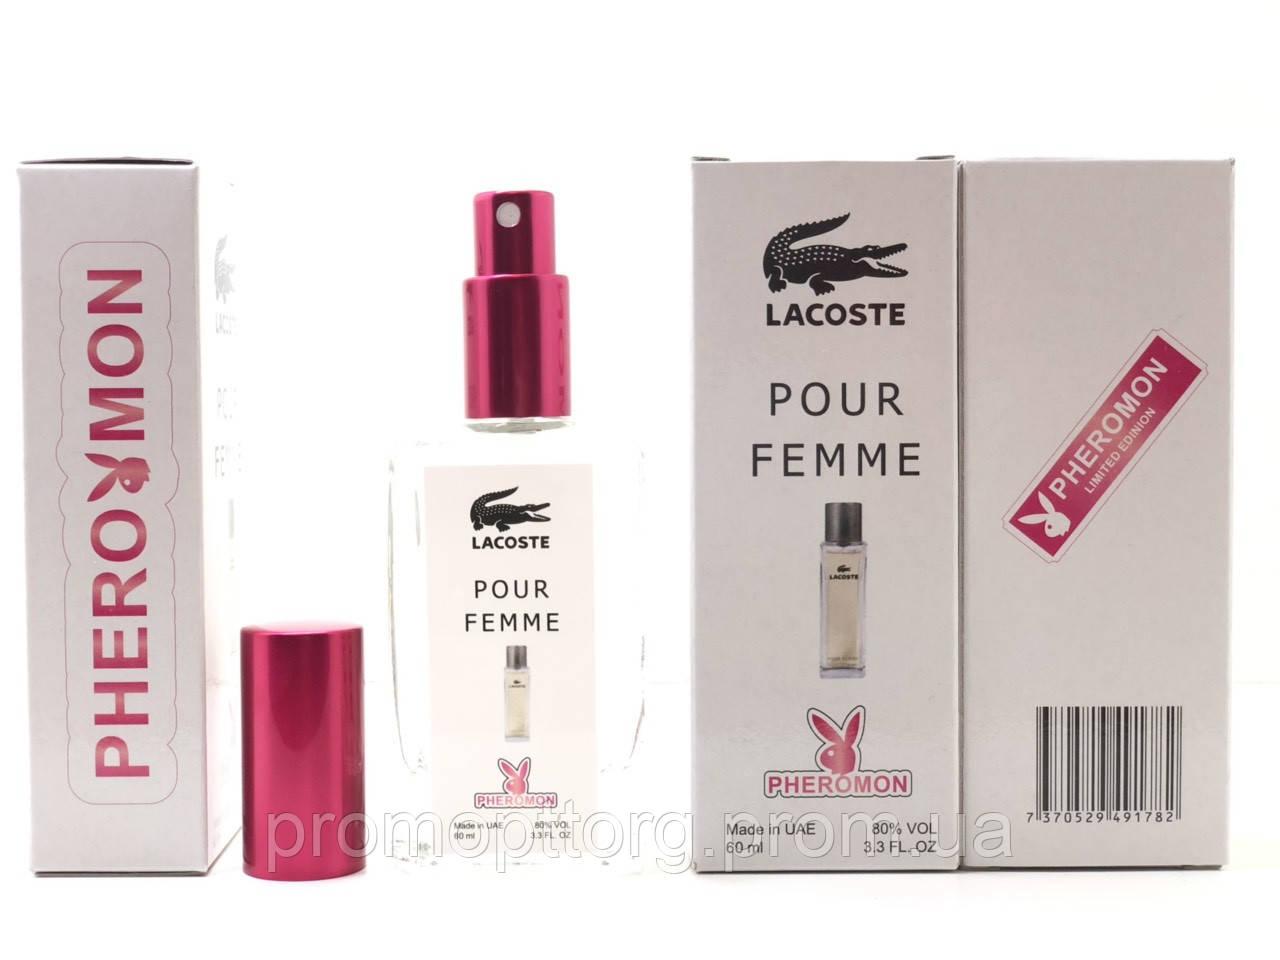 Lacoste Pour Femmeпарфюм женский тестер 60 ml с феромонами в цветной упаковке (реплика)